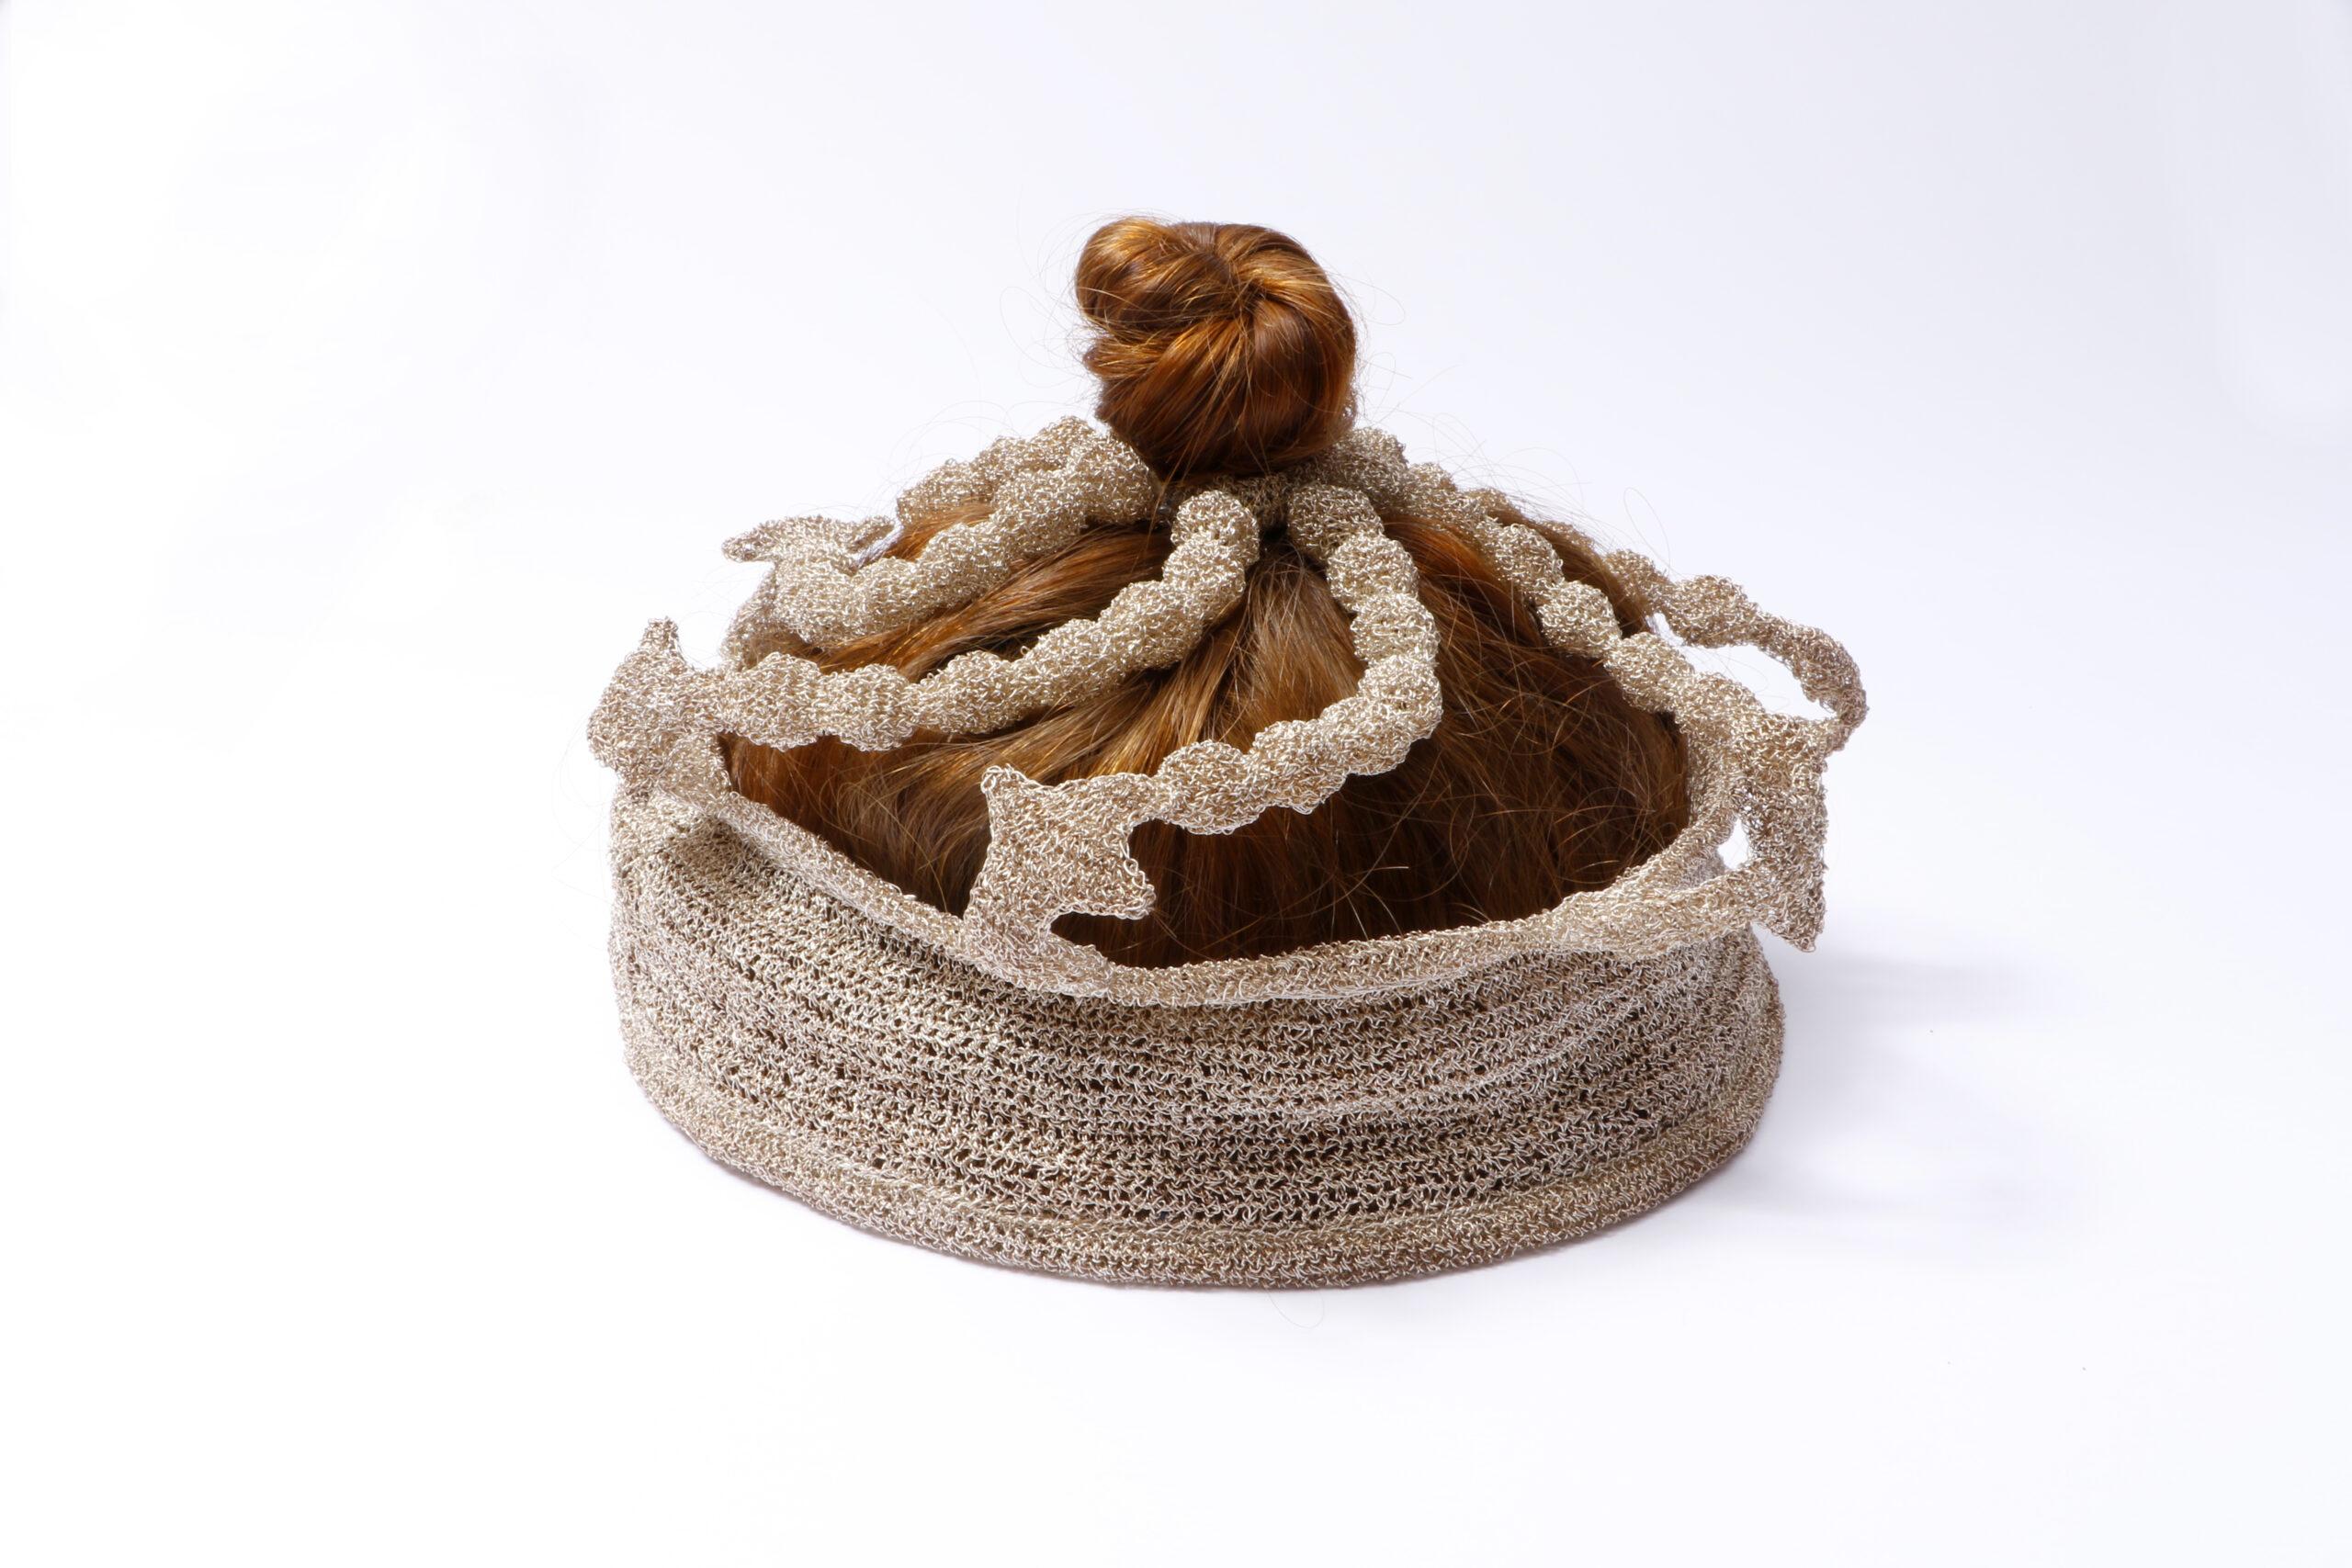 Reliqueen 2002<div style='clear:both;width:100%;height:0px;'></div><span class='desc'>Size: 6 x 6 x 8 inch + 4 x 8 x 8 inch <br>Material: Crocheted silver- and  copper tread, my hair <br>Photo: Joop van Reeken, Cissie van der Ven </span>